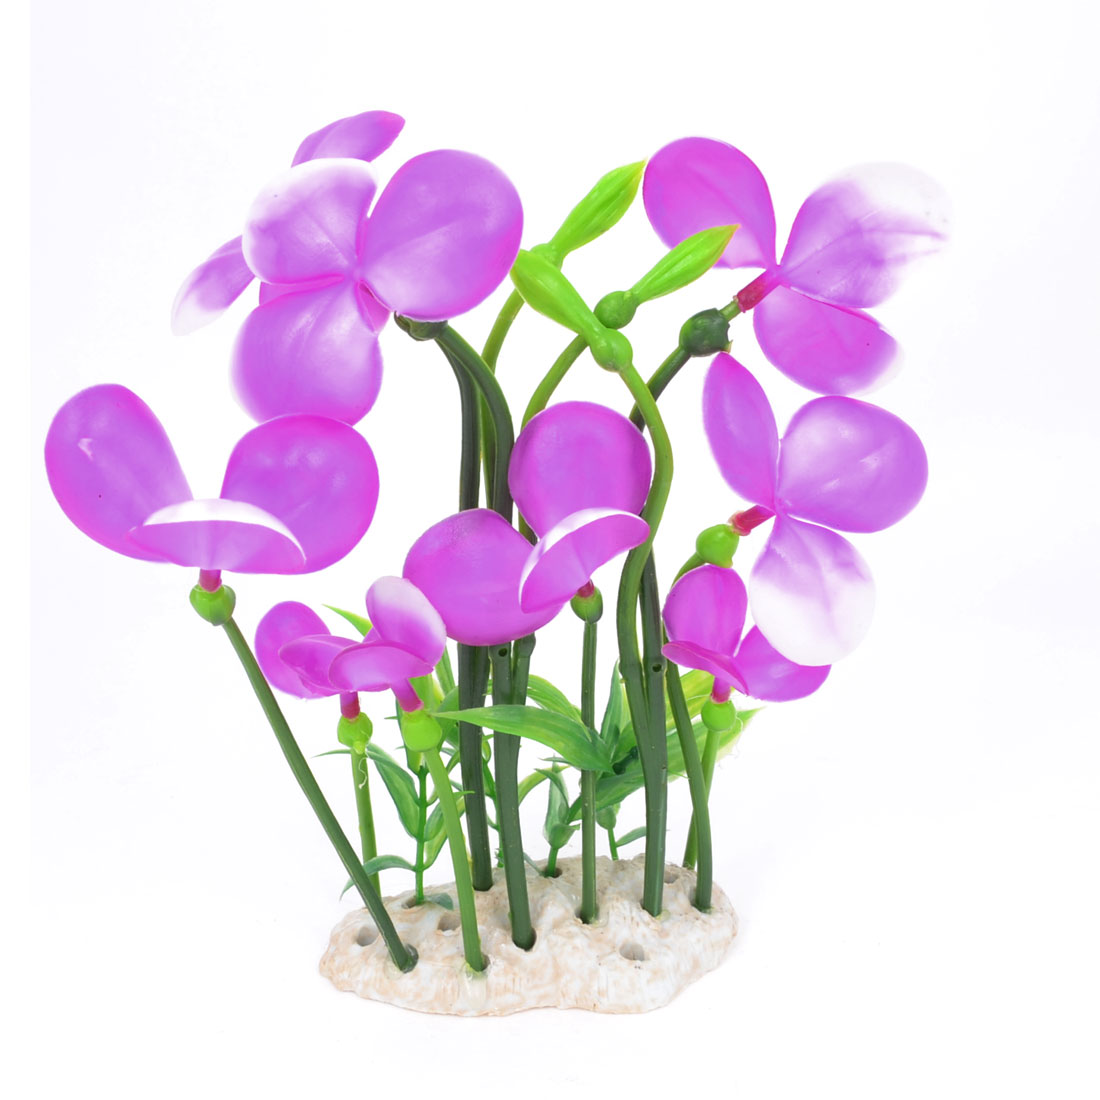 "Light Purple Manmade Simulation Fake Plant Grass Aquarium Landscaping Decor 7.5"""